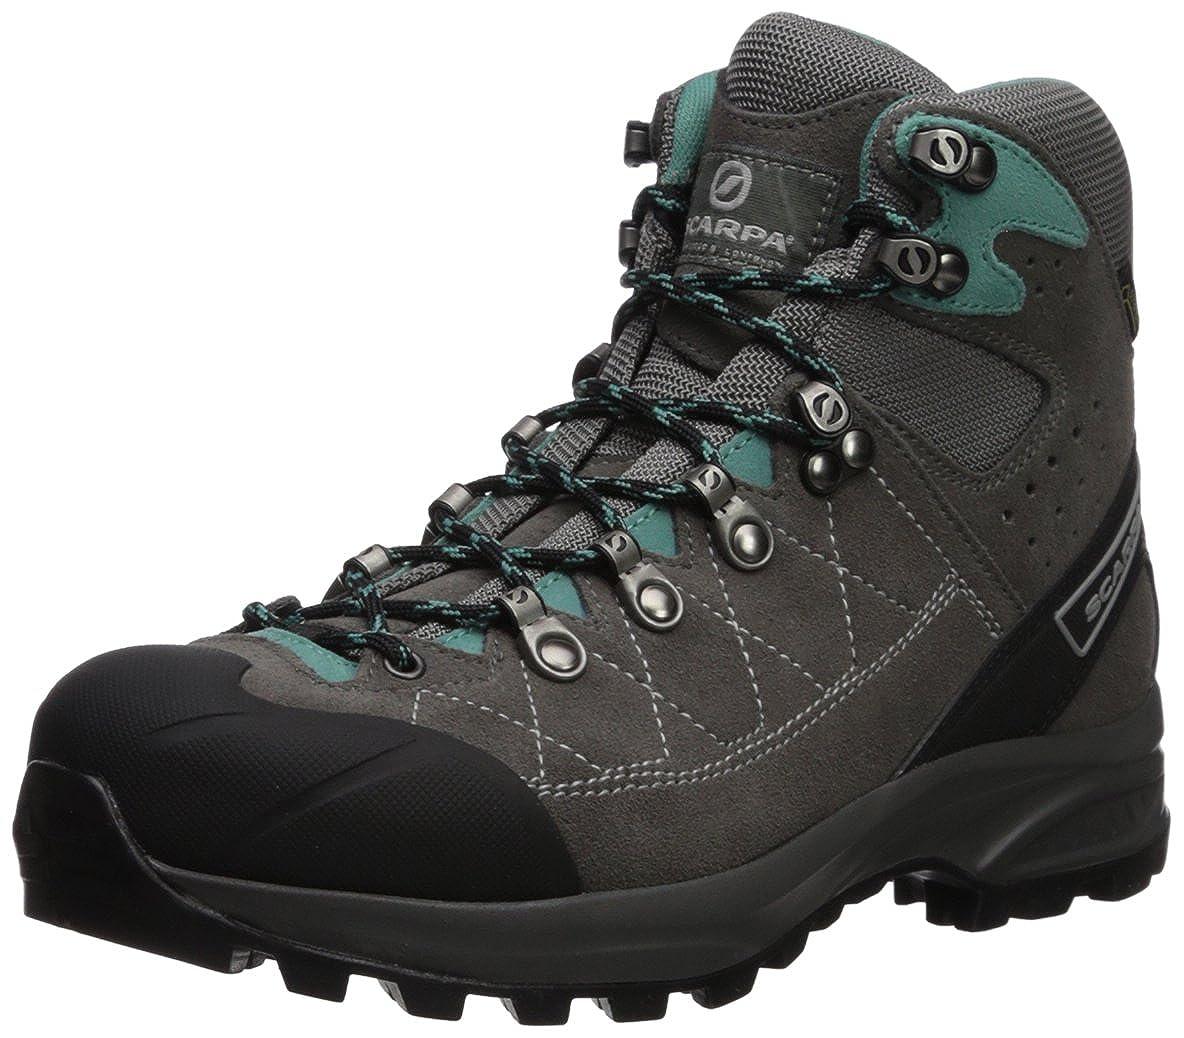 c4032481669 SCARPA Kailash Trek GTX-Women's Hiking Boot